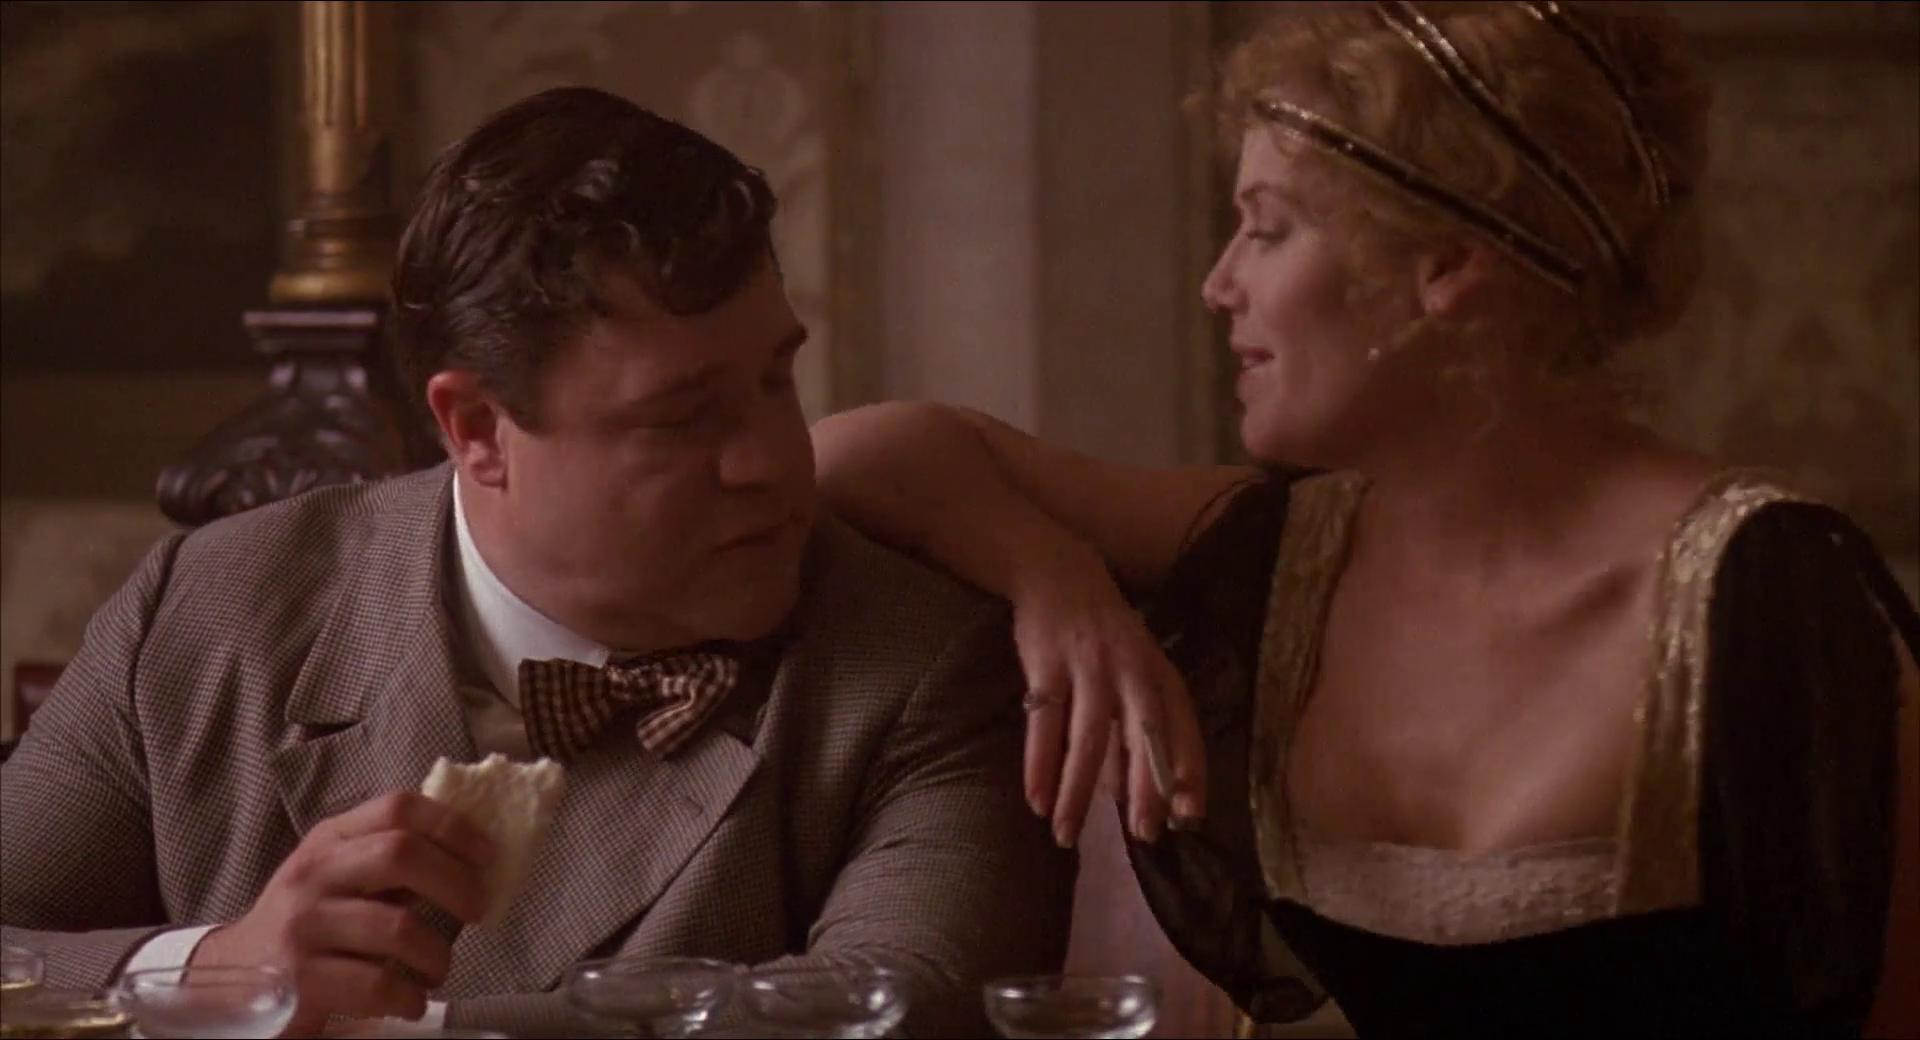 John Goodman and Kelly McGillis in The Babe (1992)